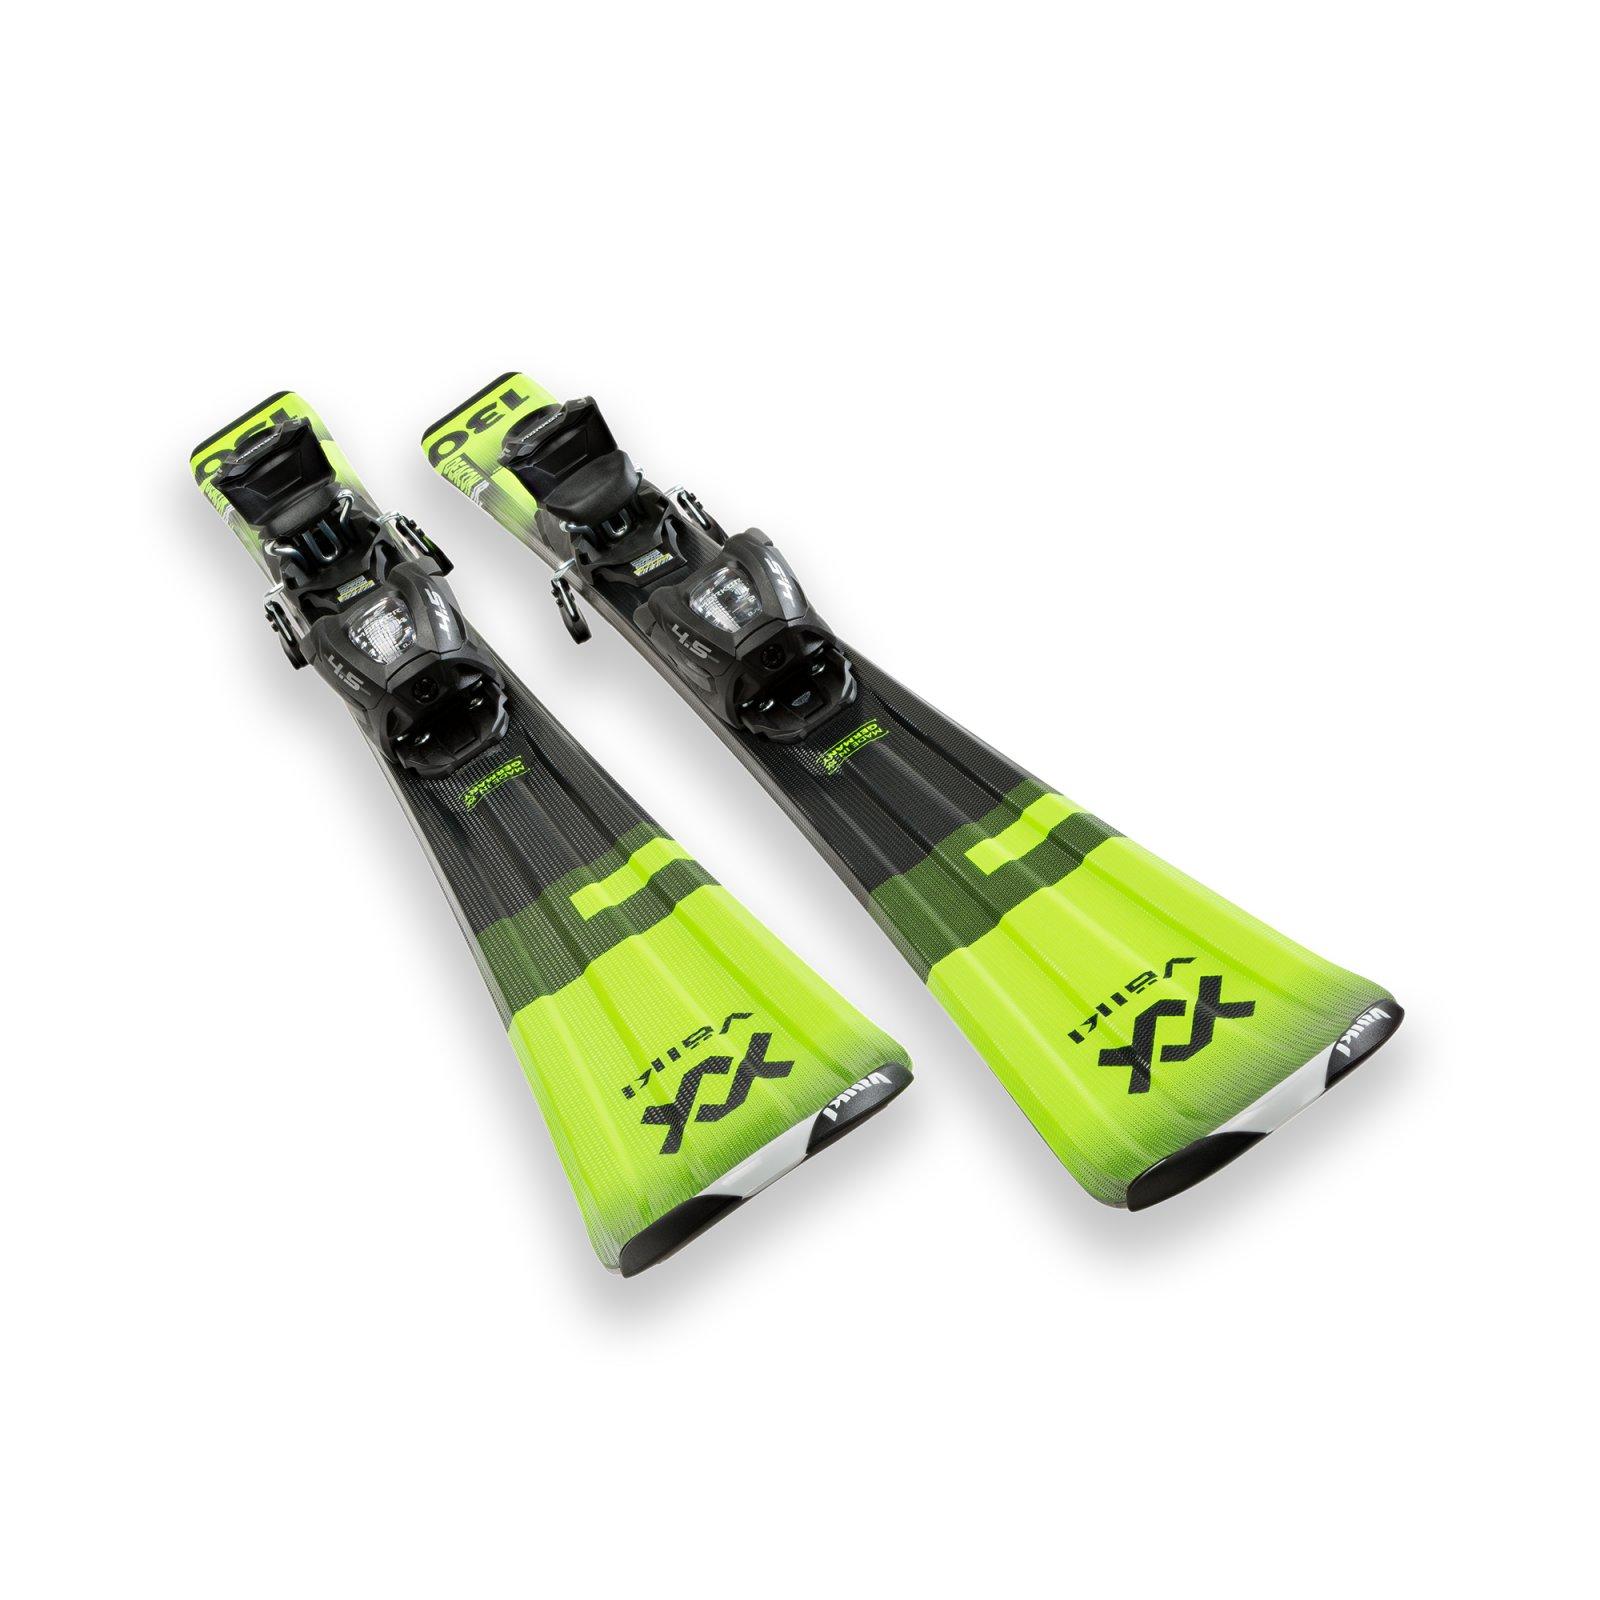 Volkl Deacon Jr 7.0 Ski w/bind